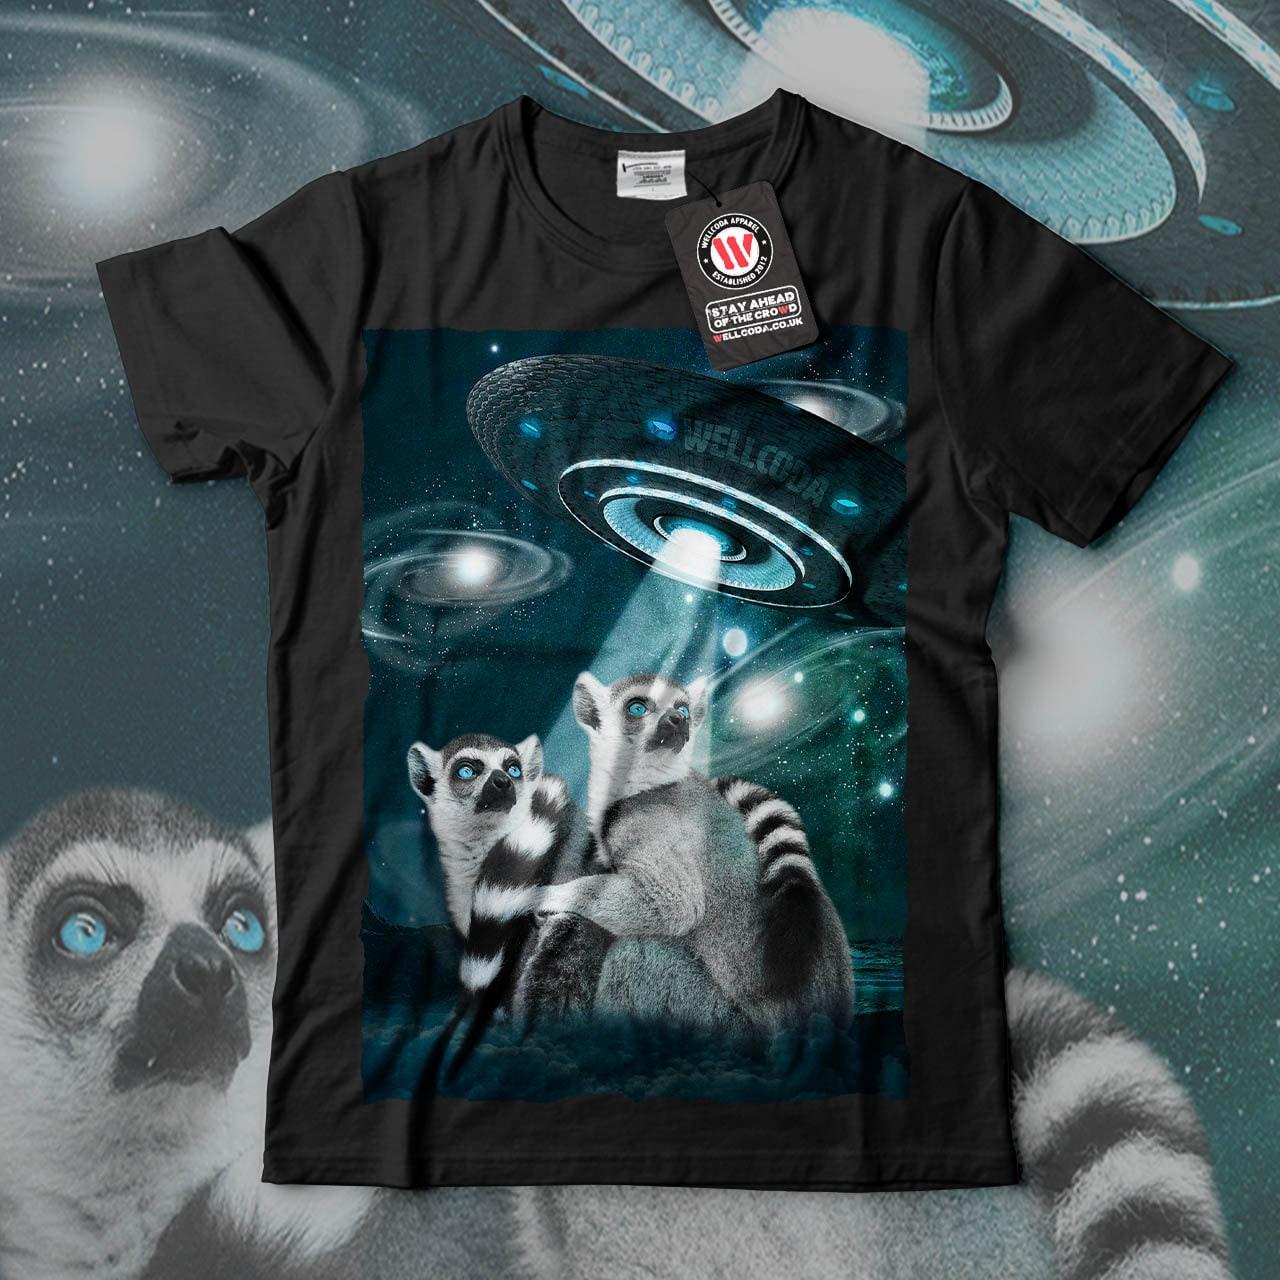 Lemur Spacecraft Space Animal Men Black White Grey Red Royal Blue Tshirt S5XL NEW  Wellcoda y1347